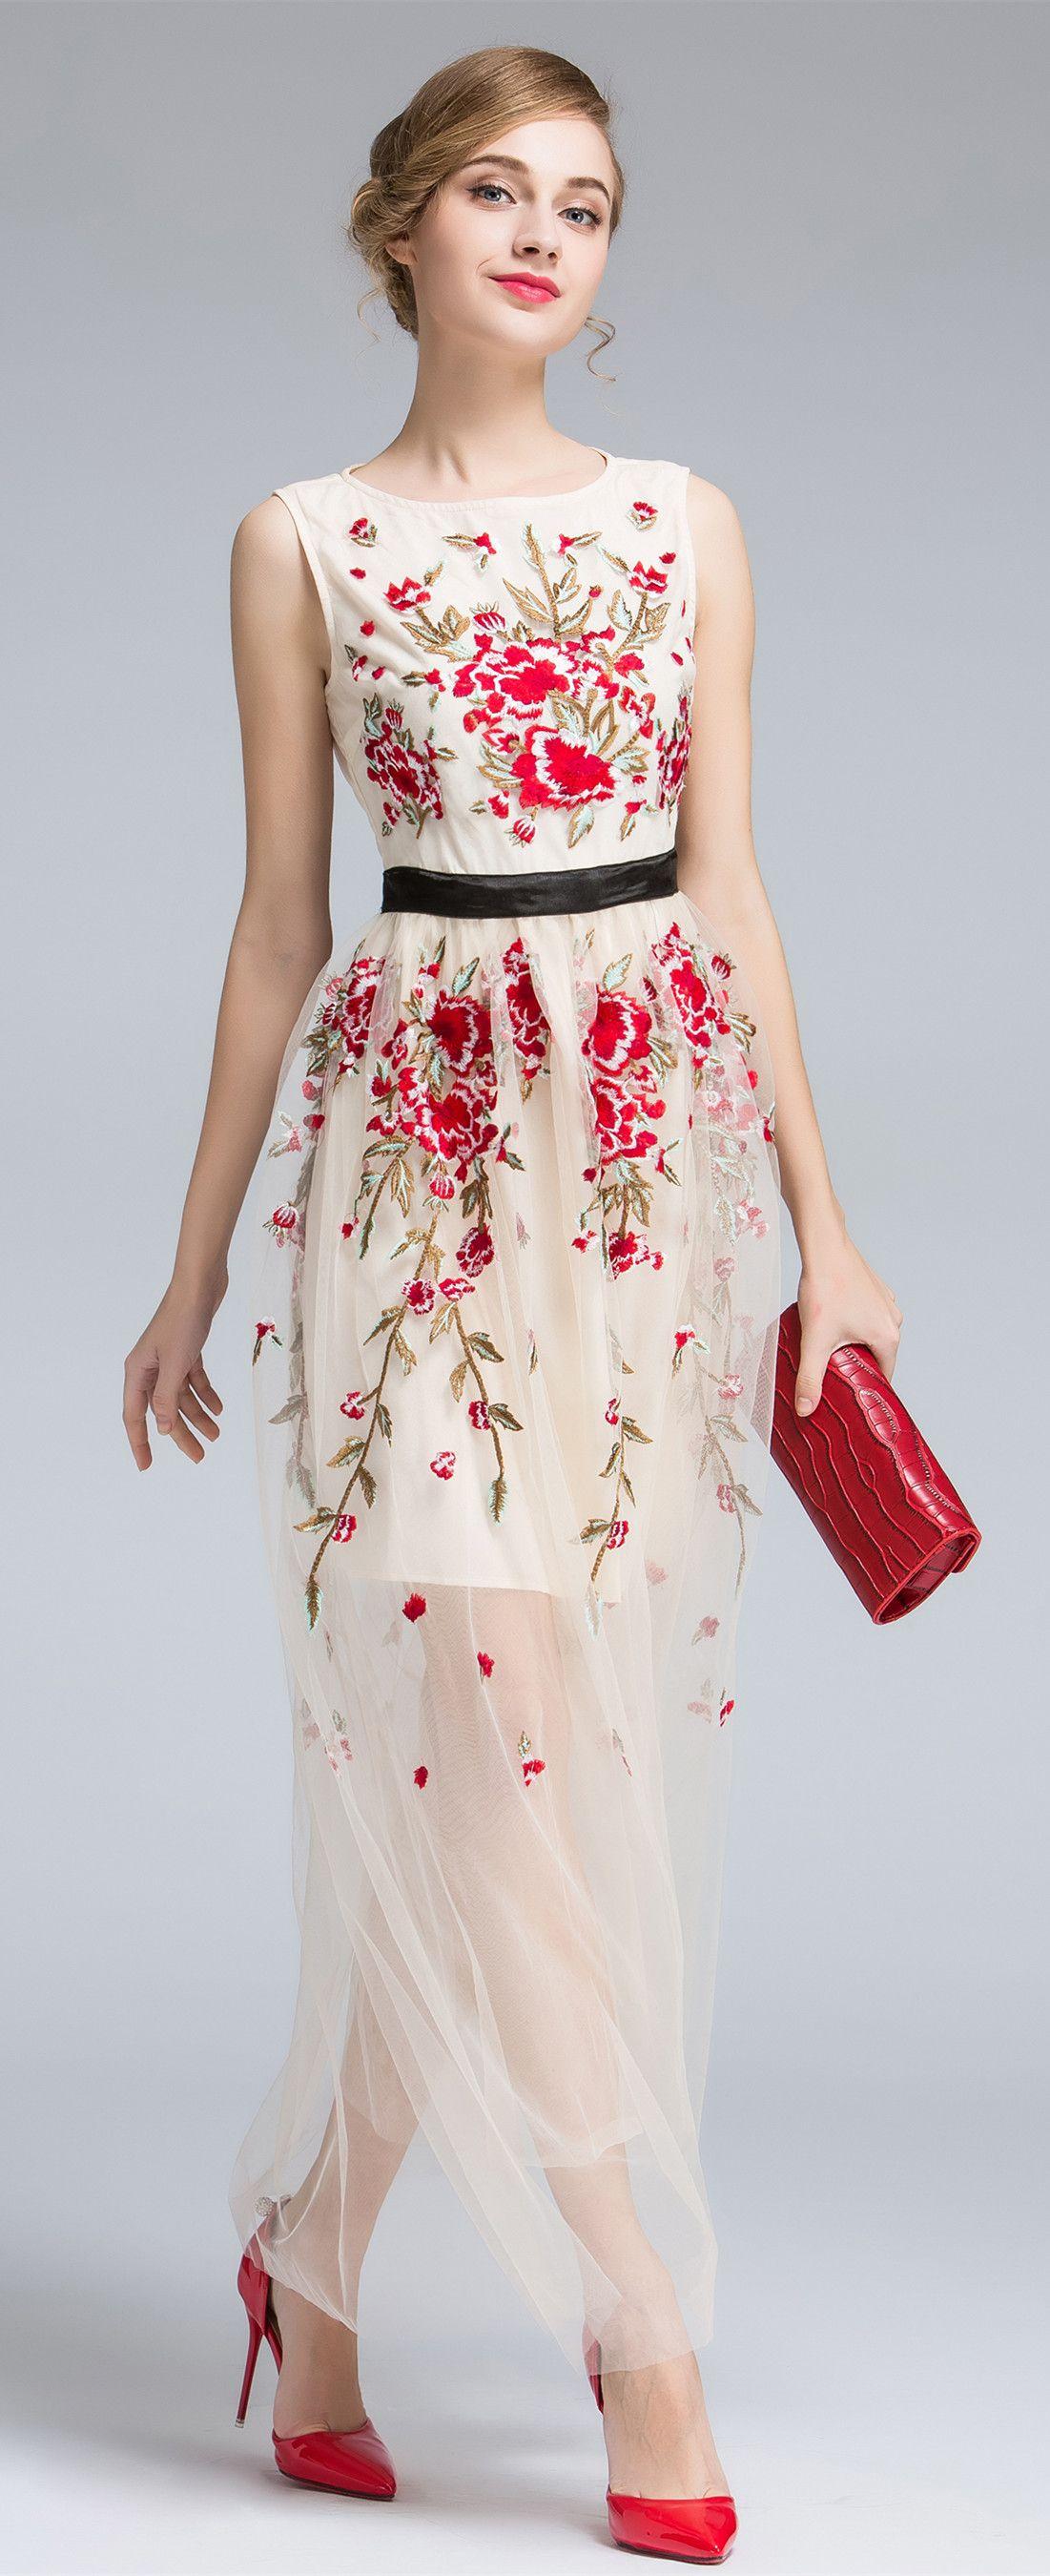 Wedding dress shops in deira dubai  Ivory Round Neck Embroidered Maxi Dress  HOT   Pinterest  Maxi